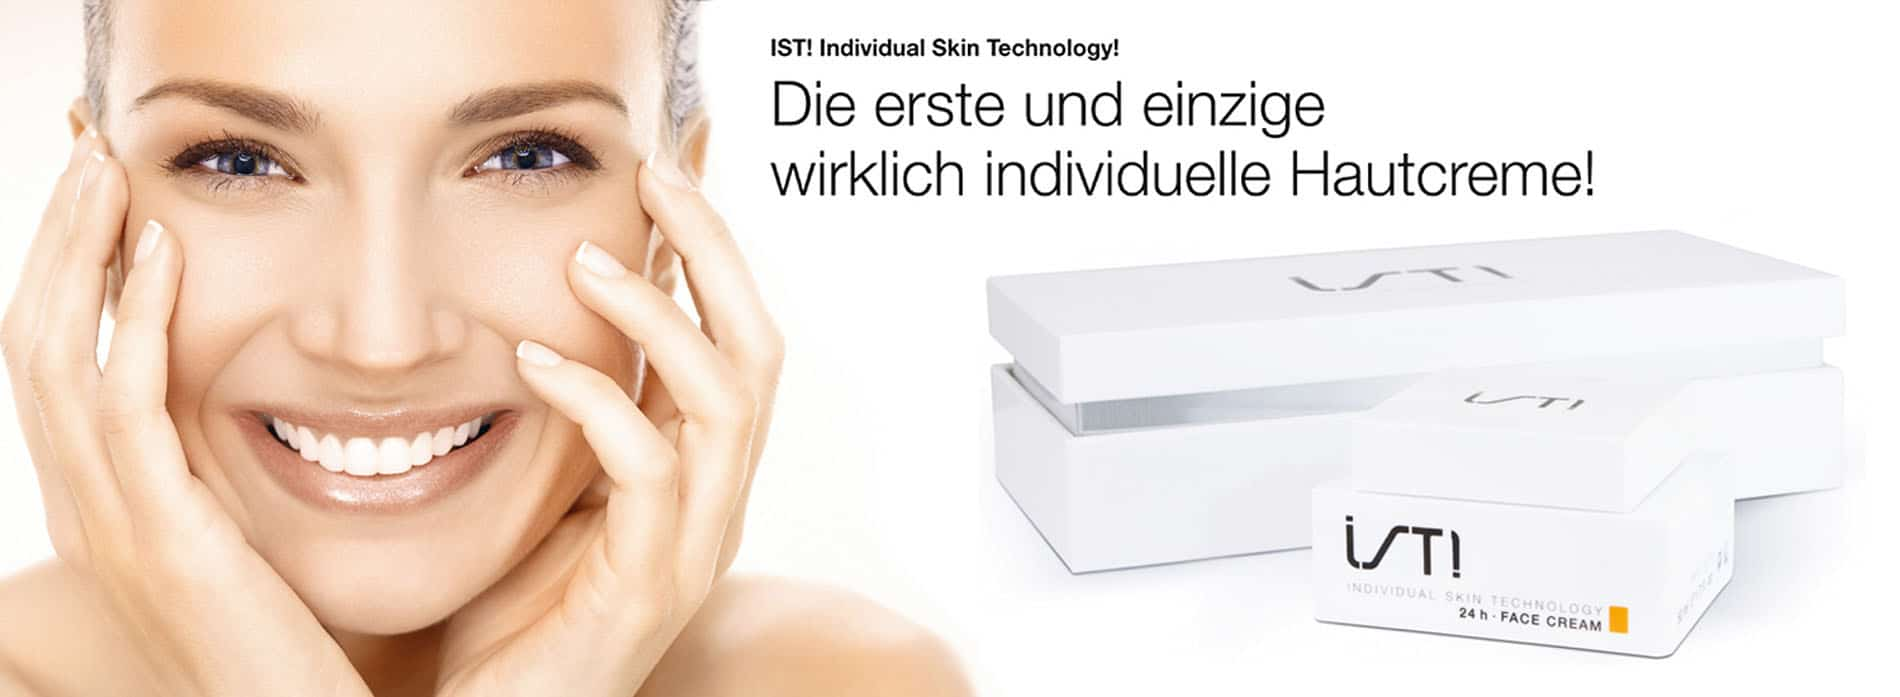 Individual Skin Technology individuelle Hautcremes